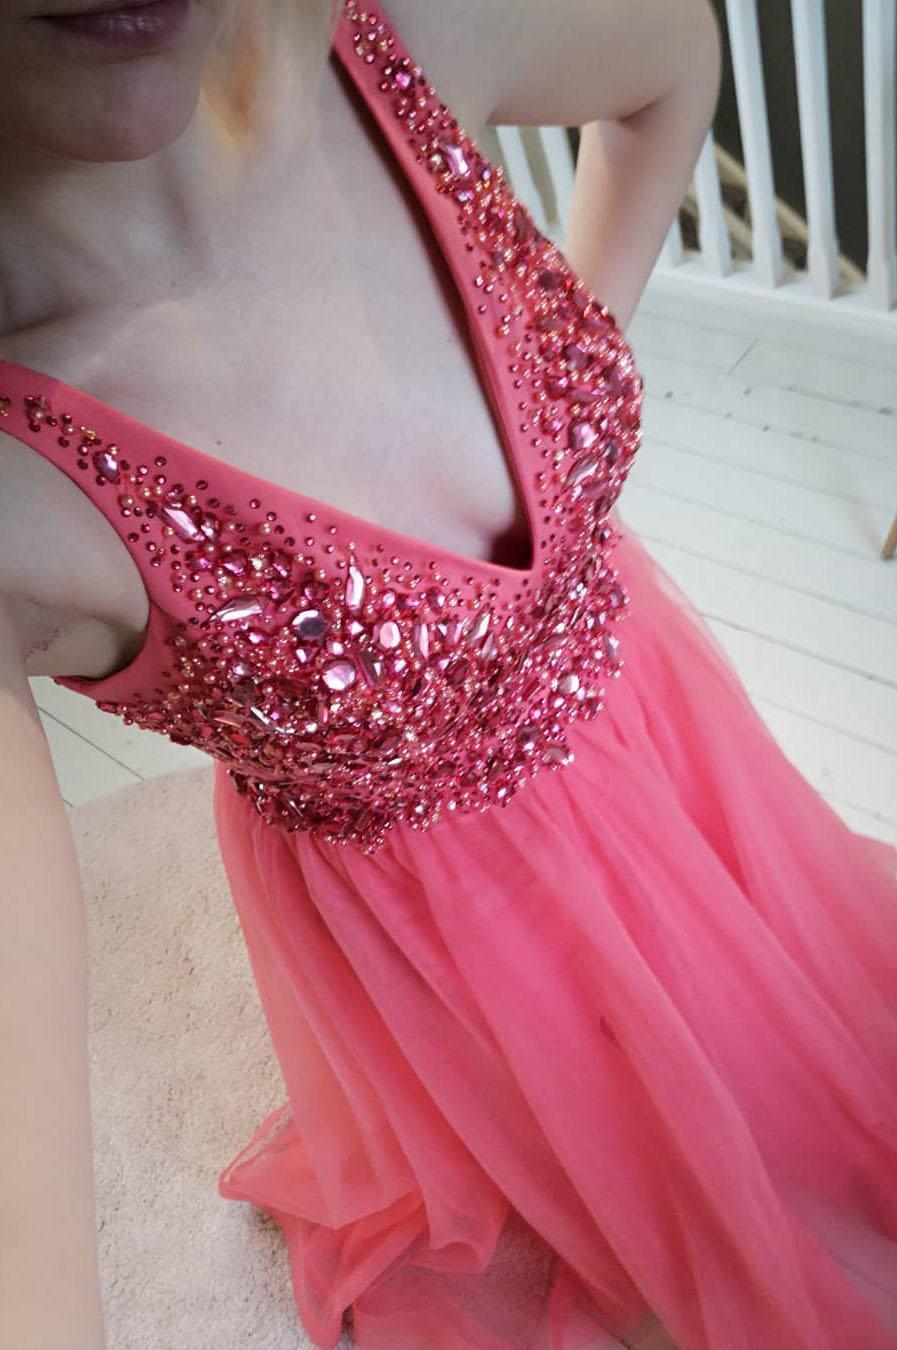 Fashion Prom Dresses Beads Tops Tulle Evening Dress V Neck A-lin Vestidos De Festa Custom Made Formal Party Second Reception Gowns